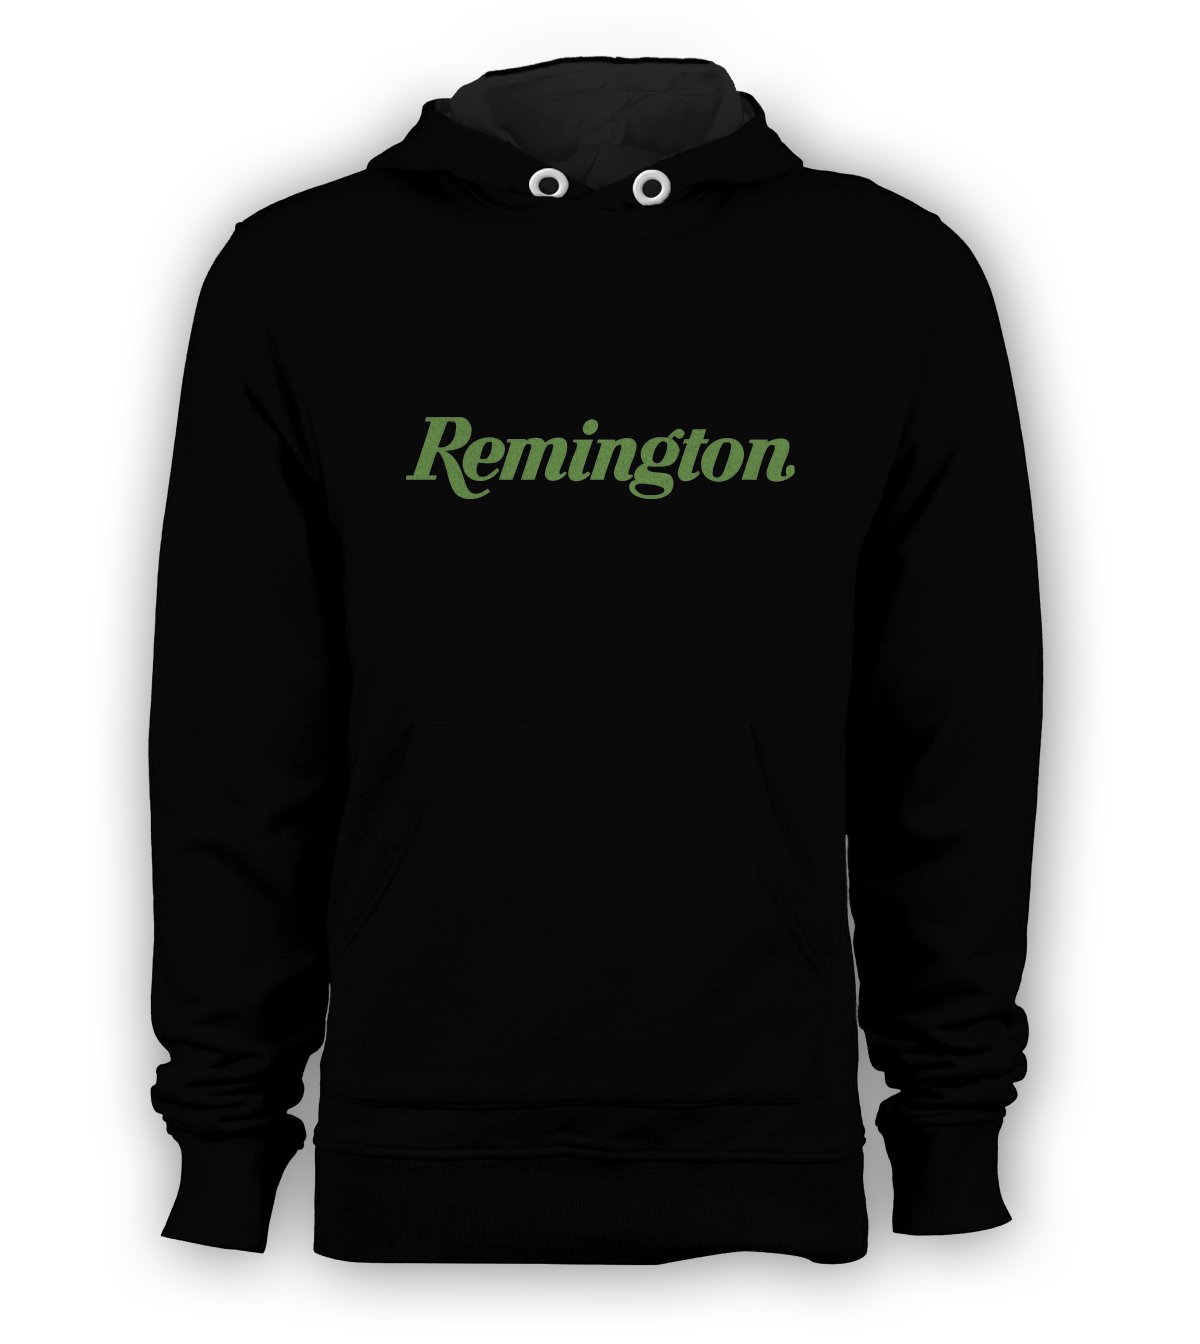 Remington Firearms Rifle Pistol Gun Pullover Hoodie Men Sweatshirts Size S to 3XL New Black